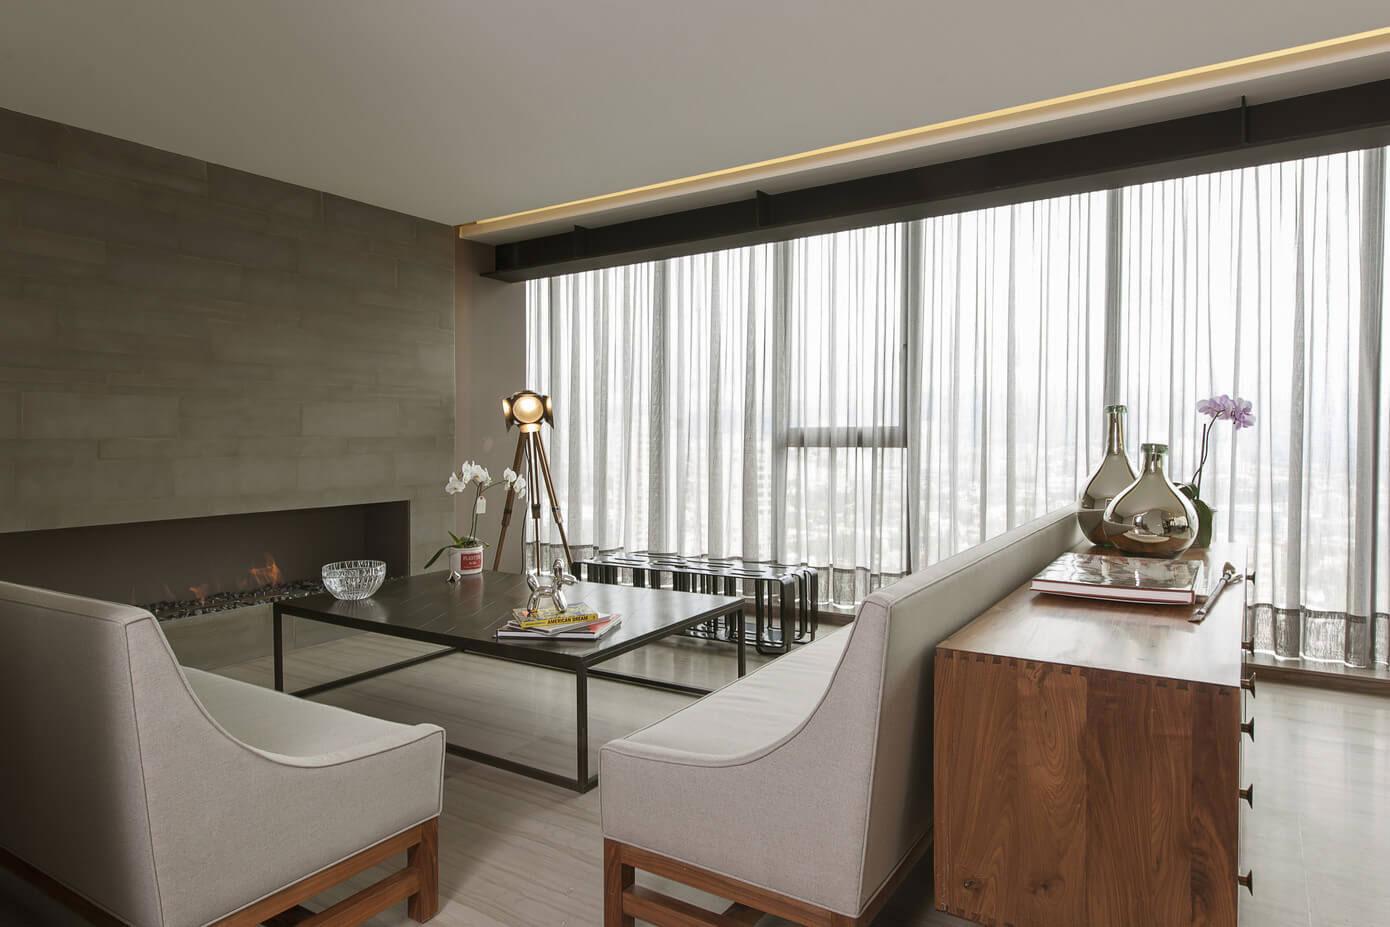 Contemporary CM Apartment in Mexico City by Kababie Arquitectos-04